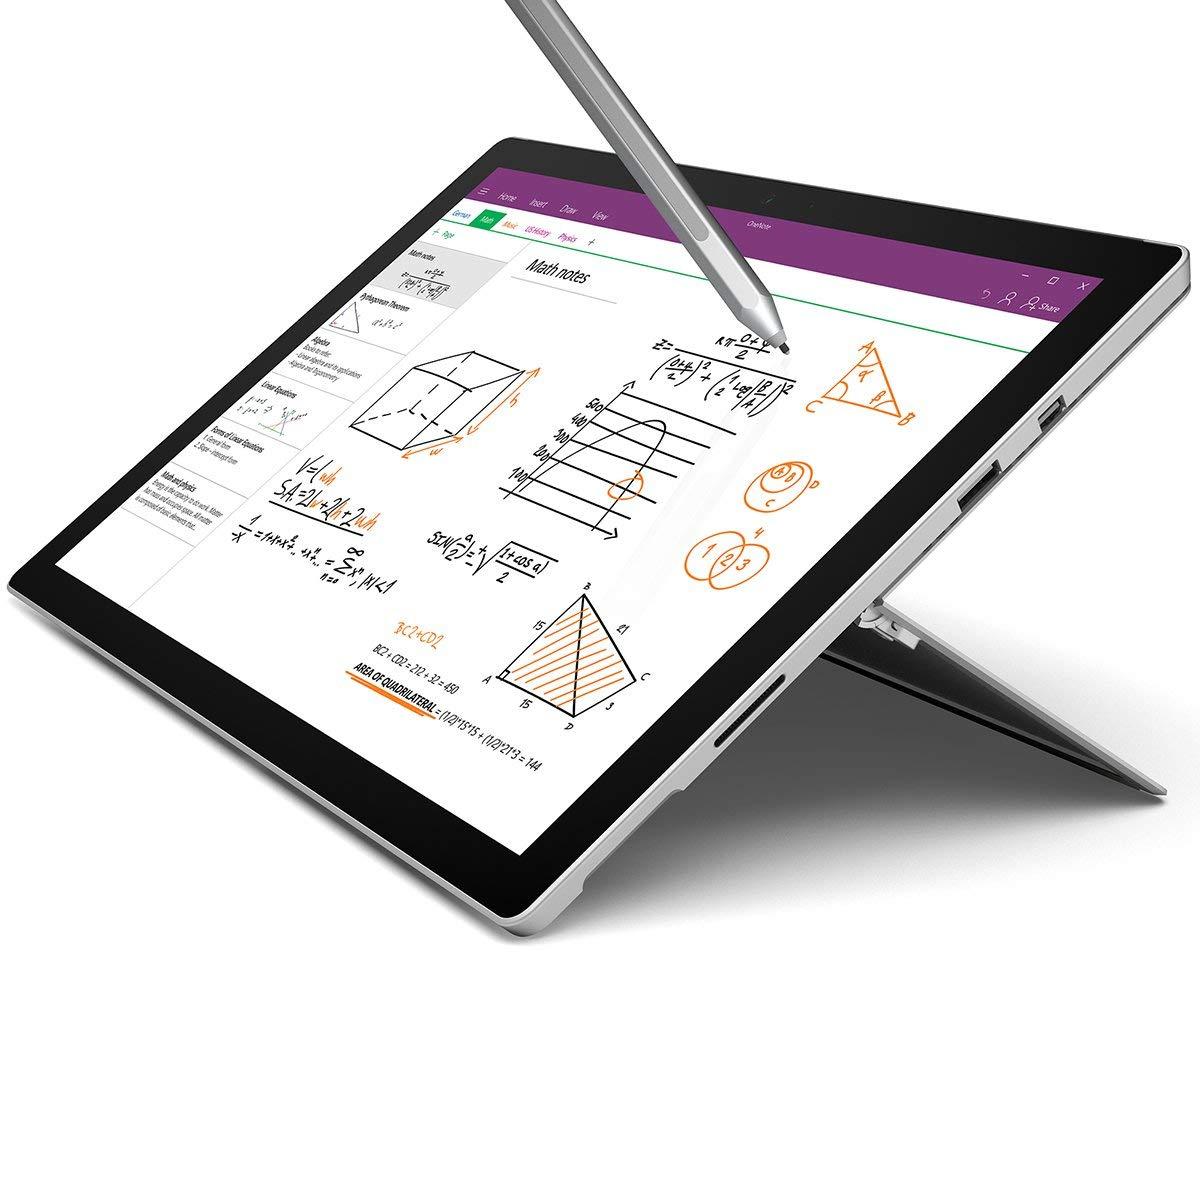 Surface Pro 4 amazon 1